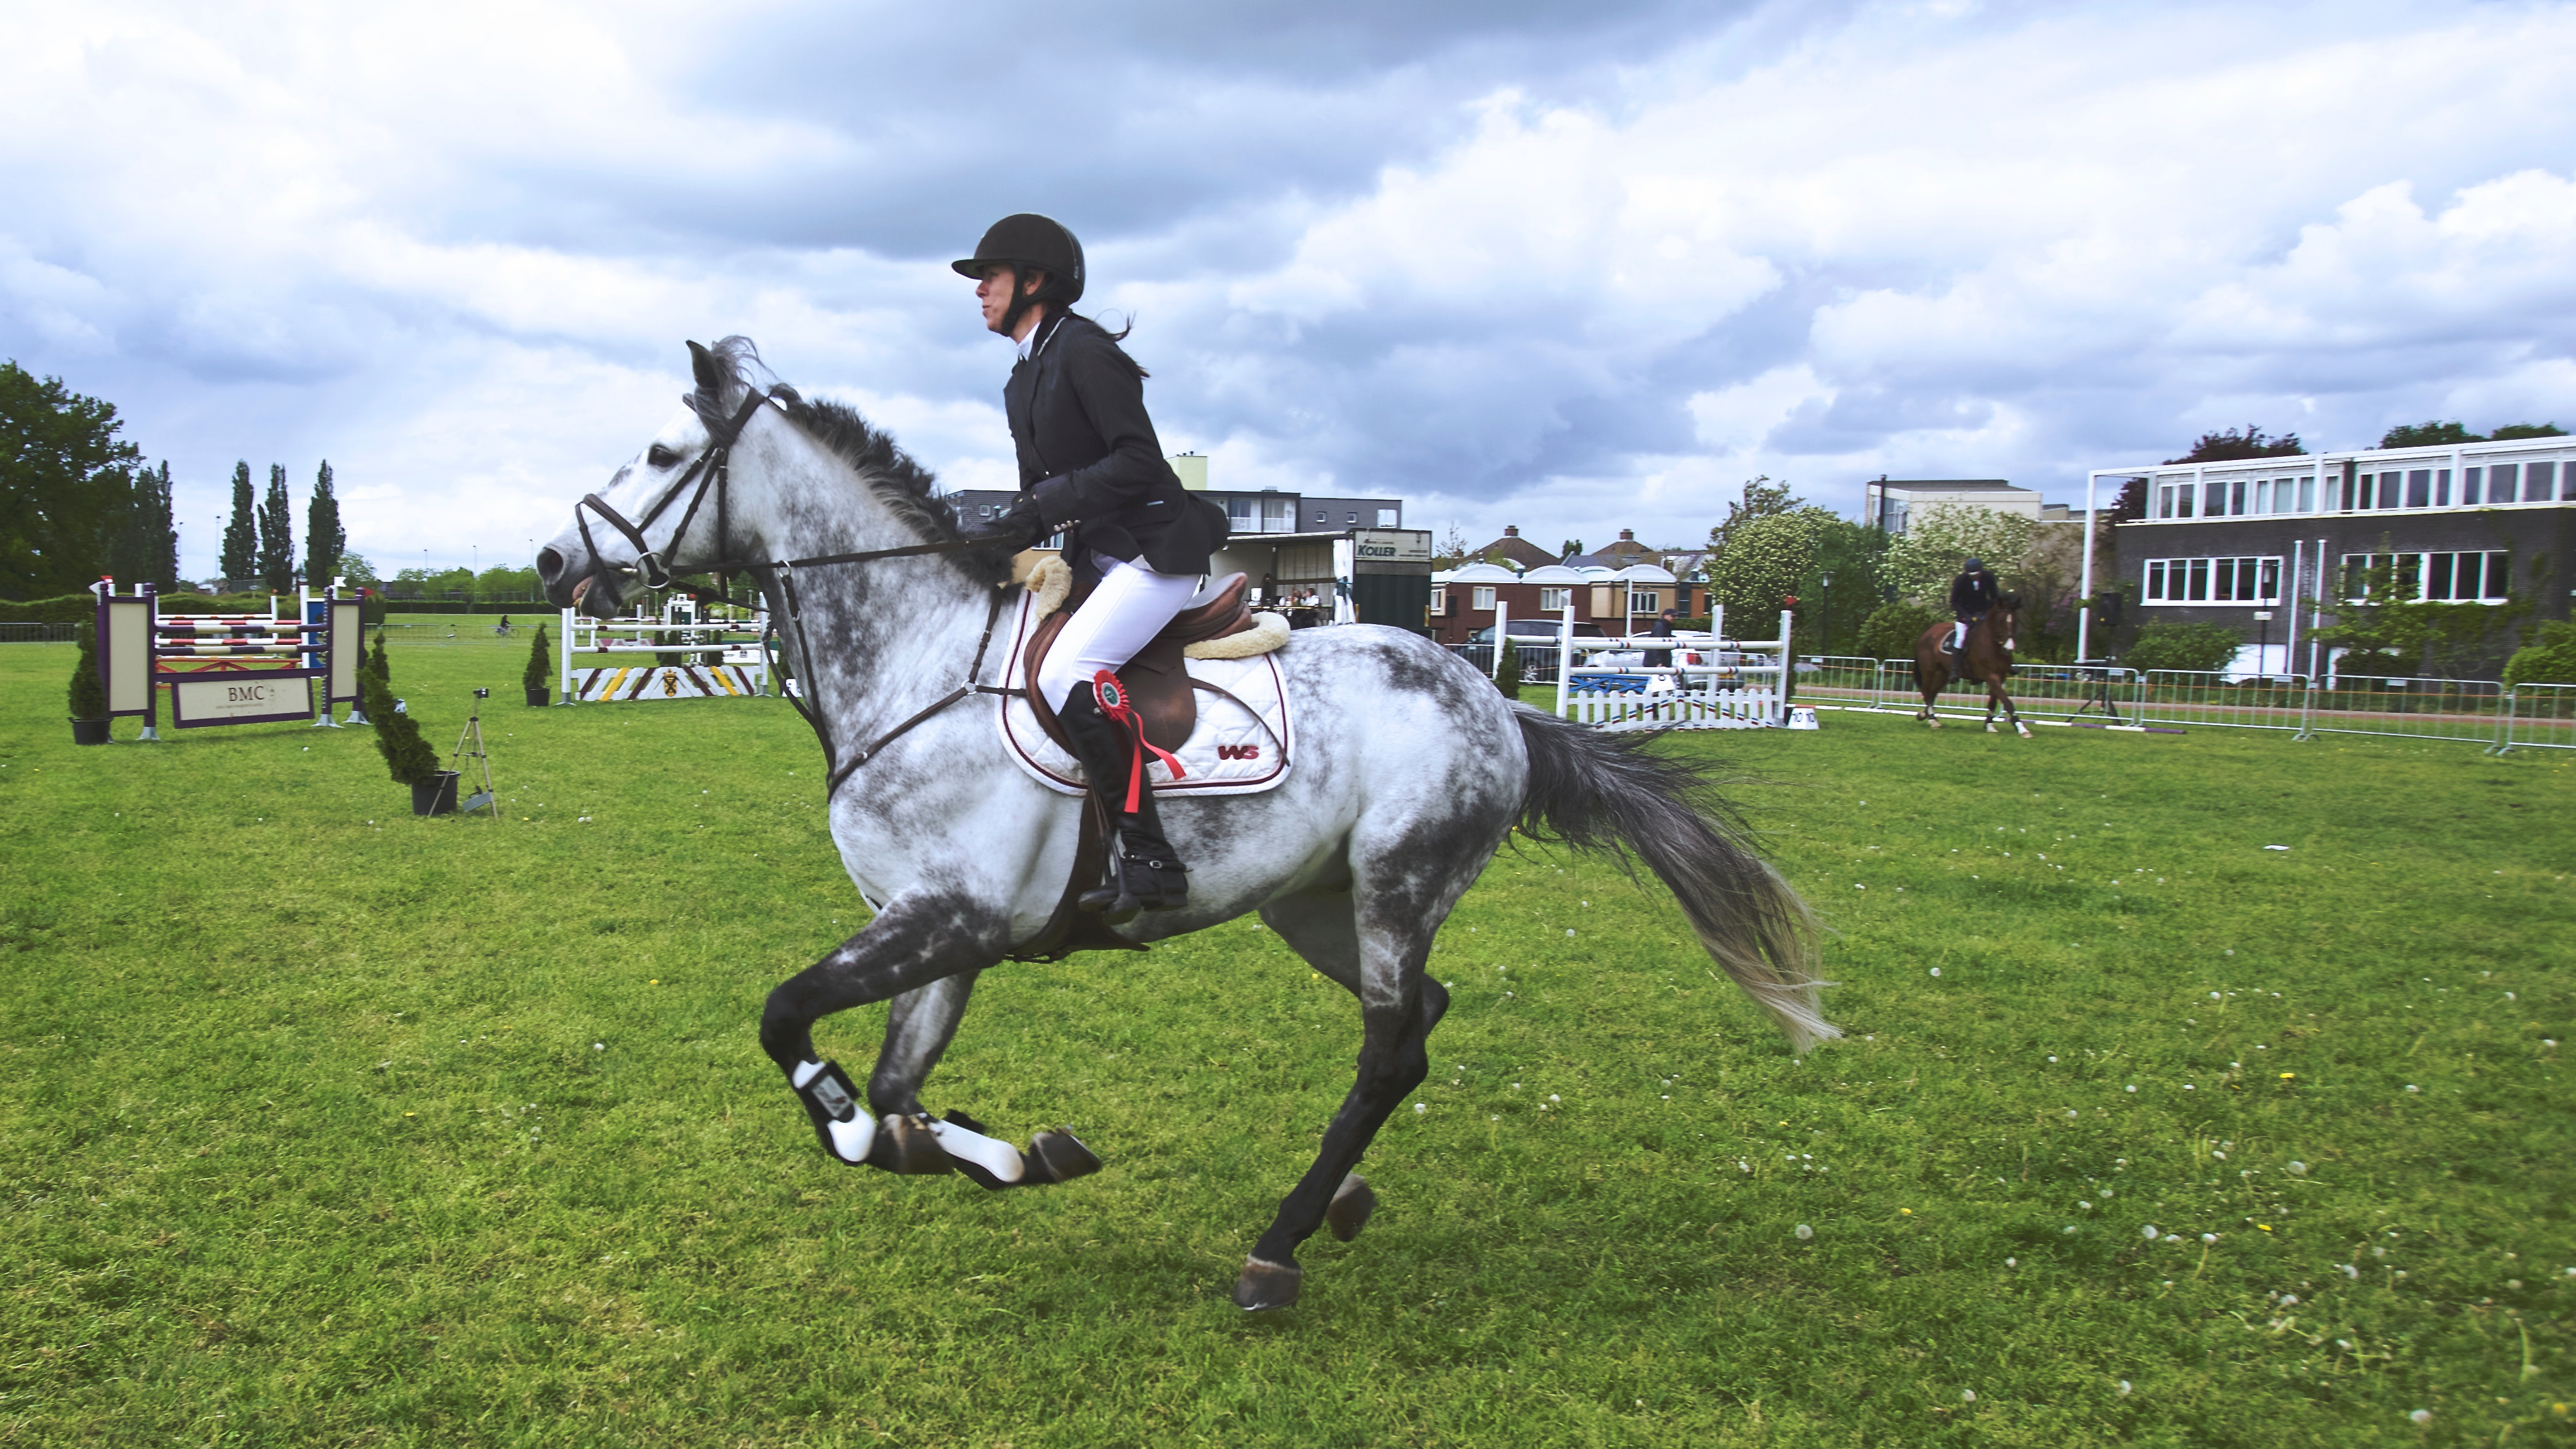 horse-action-dutch-sports-103543